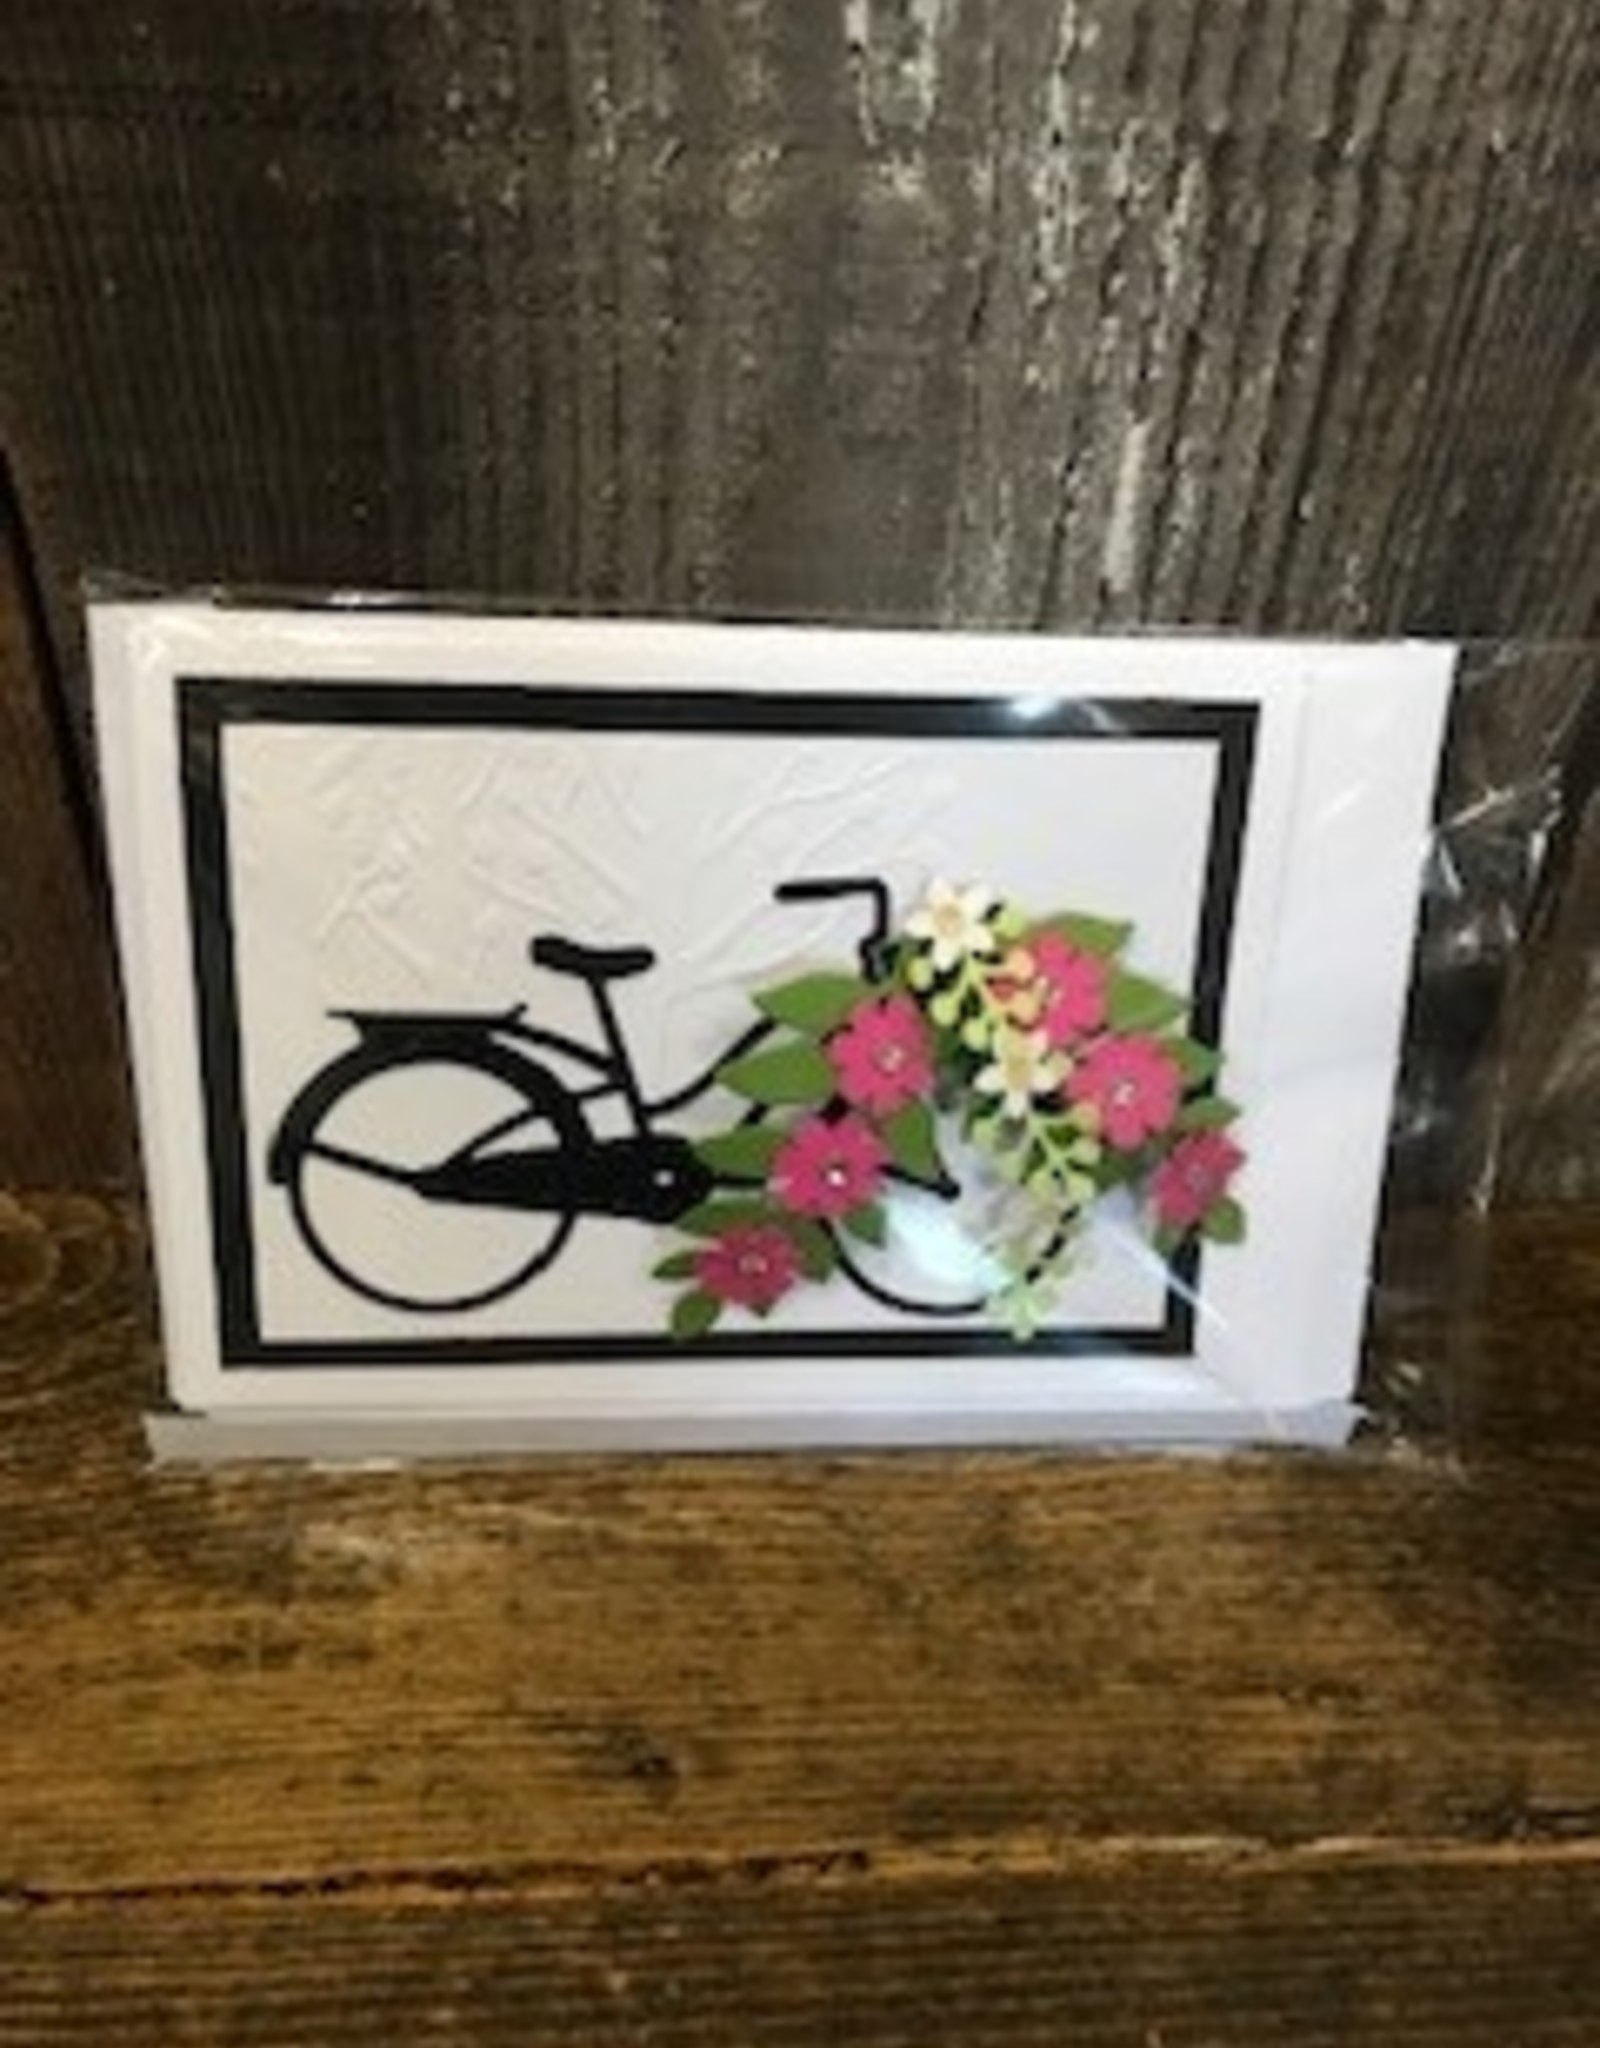 Christine Saksewski Bicycle with Flower Basket - BP